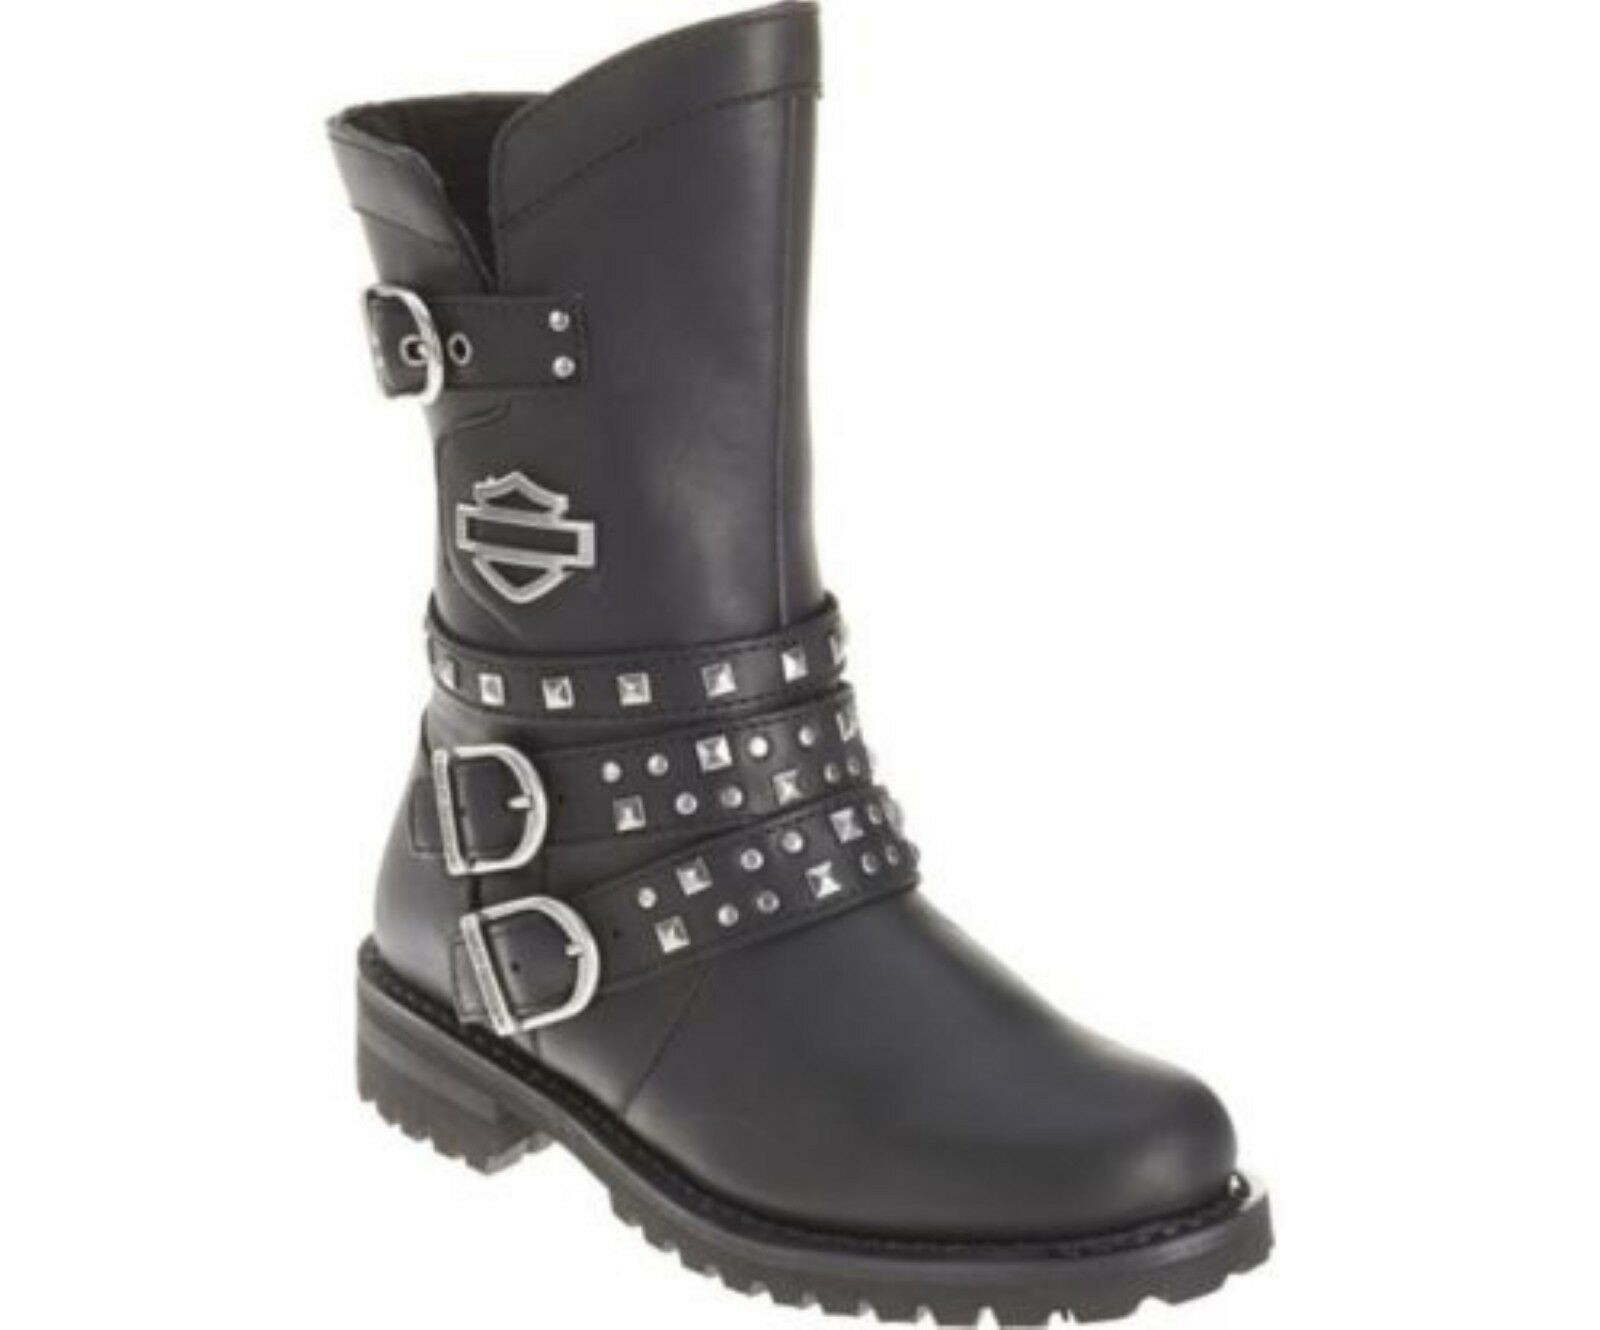 Grandes zapatos con descuento Harley Davidson Adrian Ladies Biker Boots Black Leather Triple Buckle Motorbike